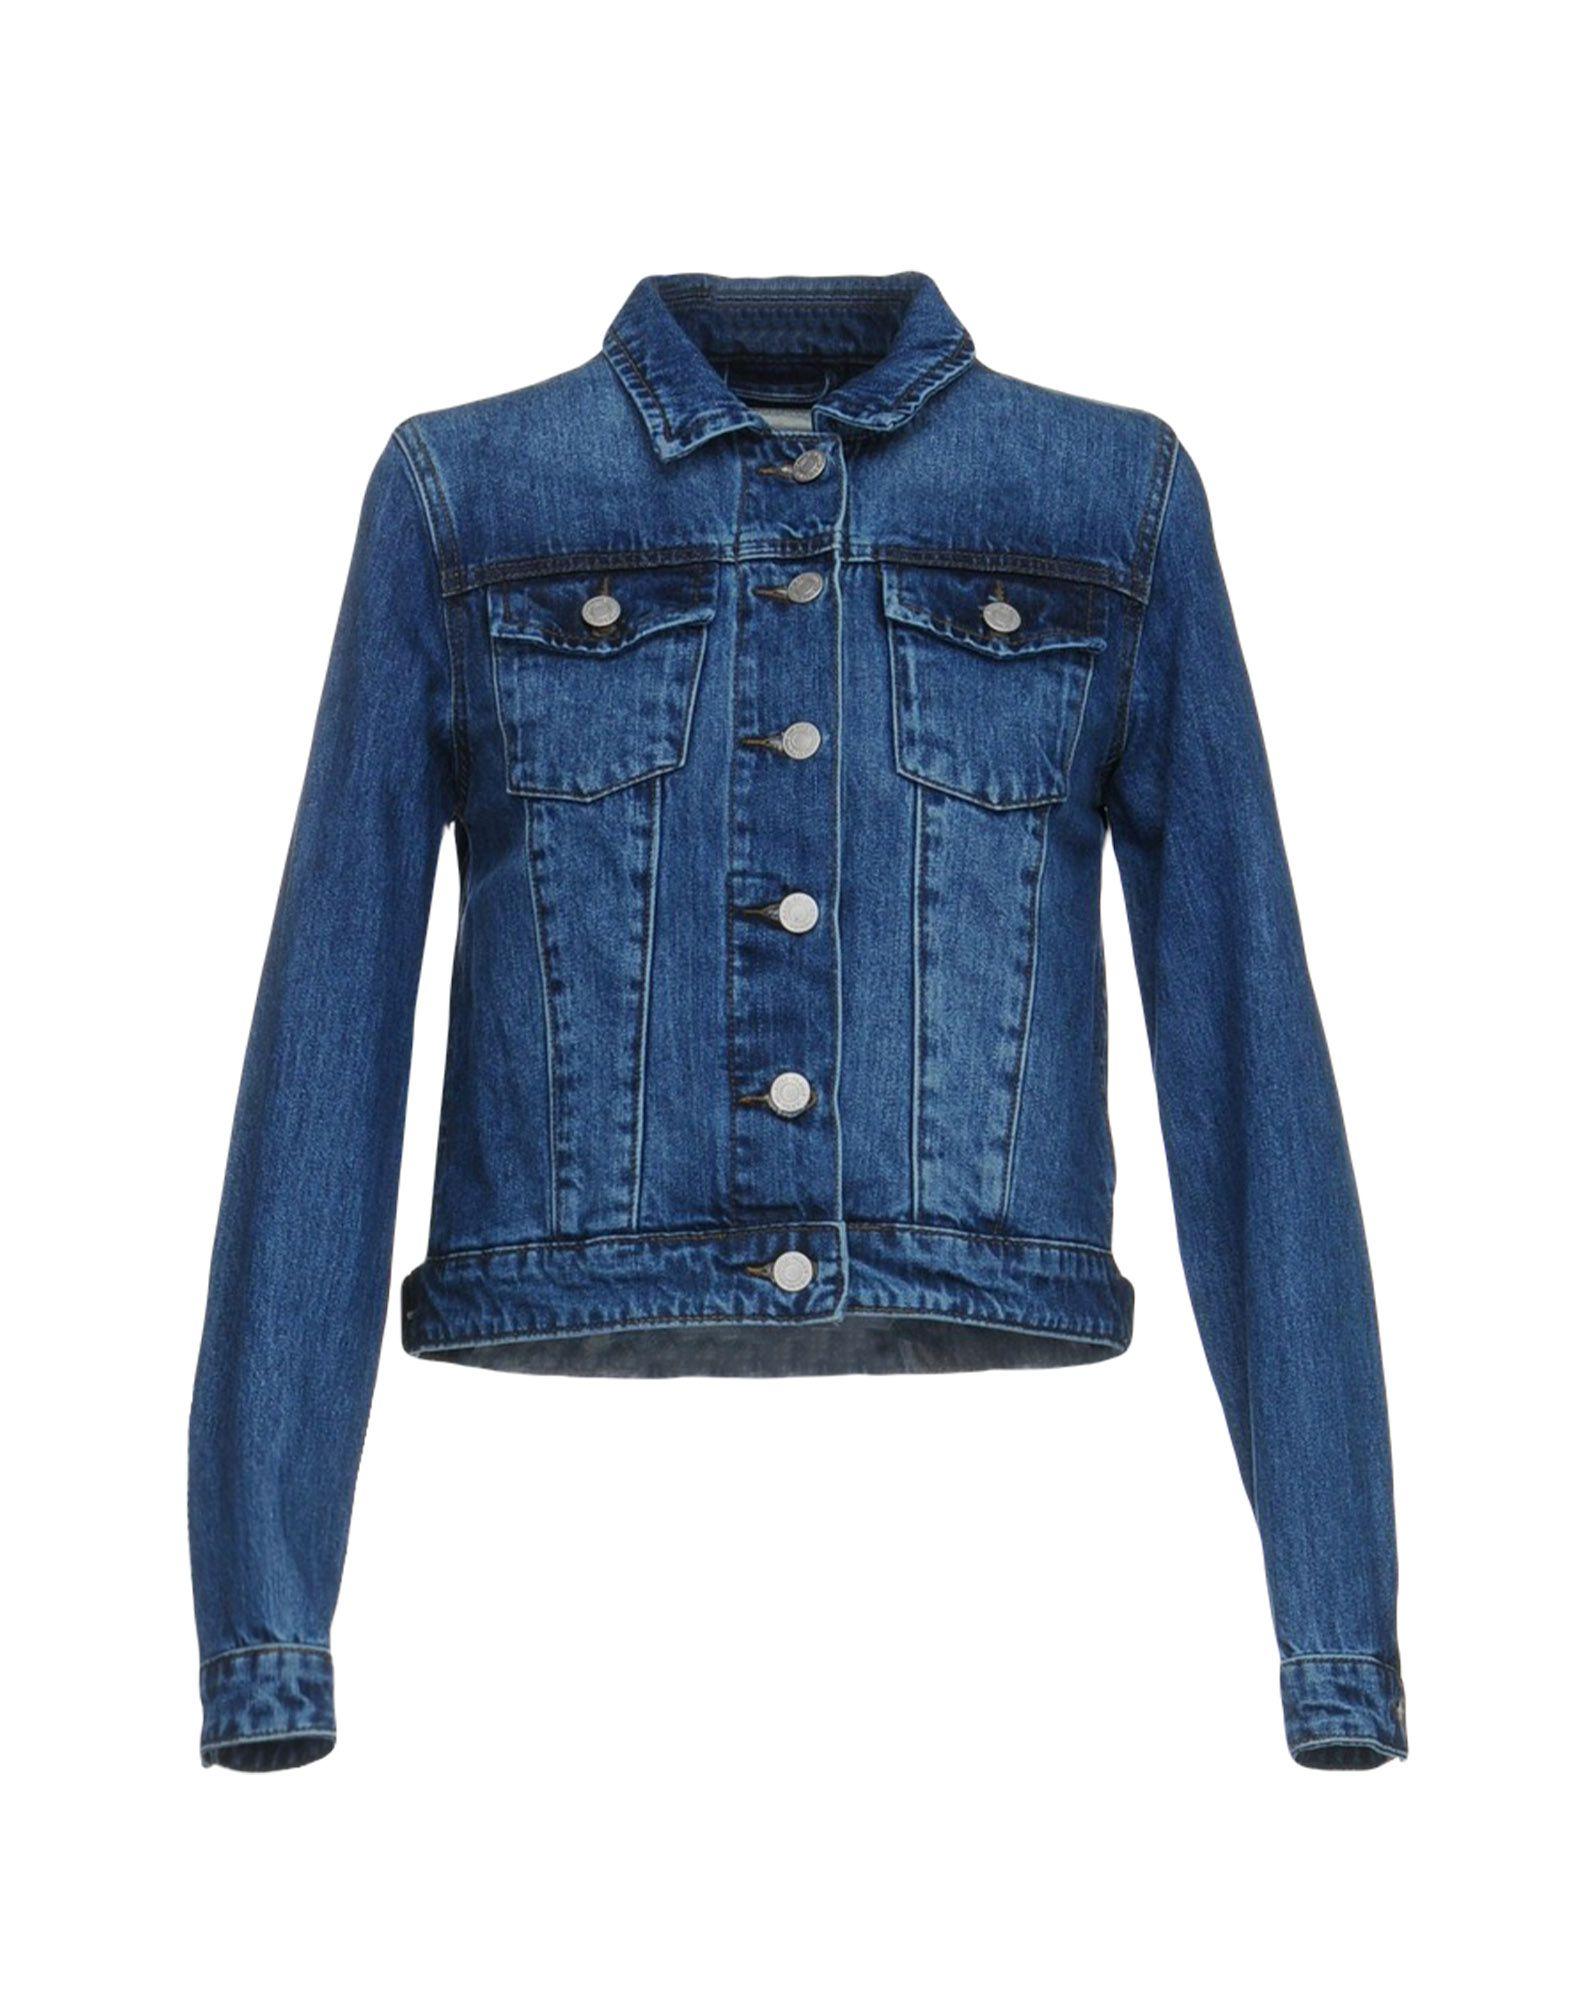 SELECTED FEMME Джинсовая верхняя одежда одежда из кожи selected sld 412428004